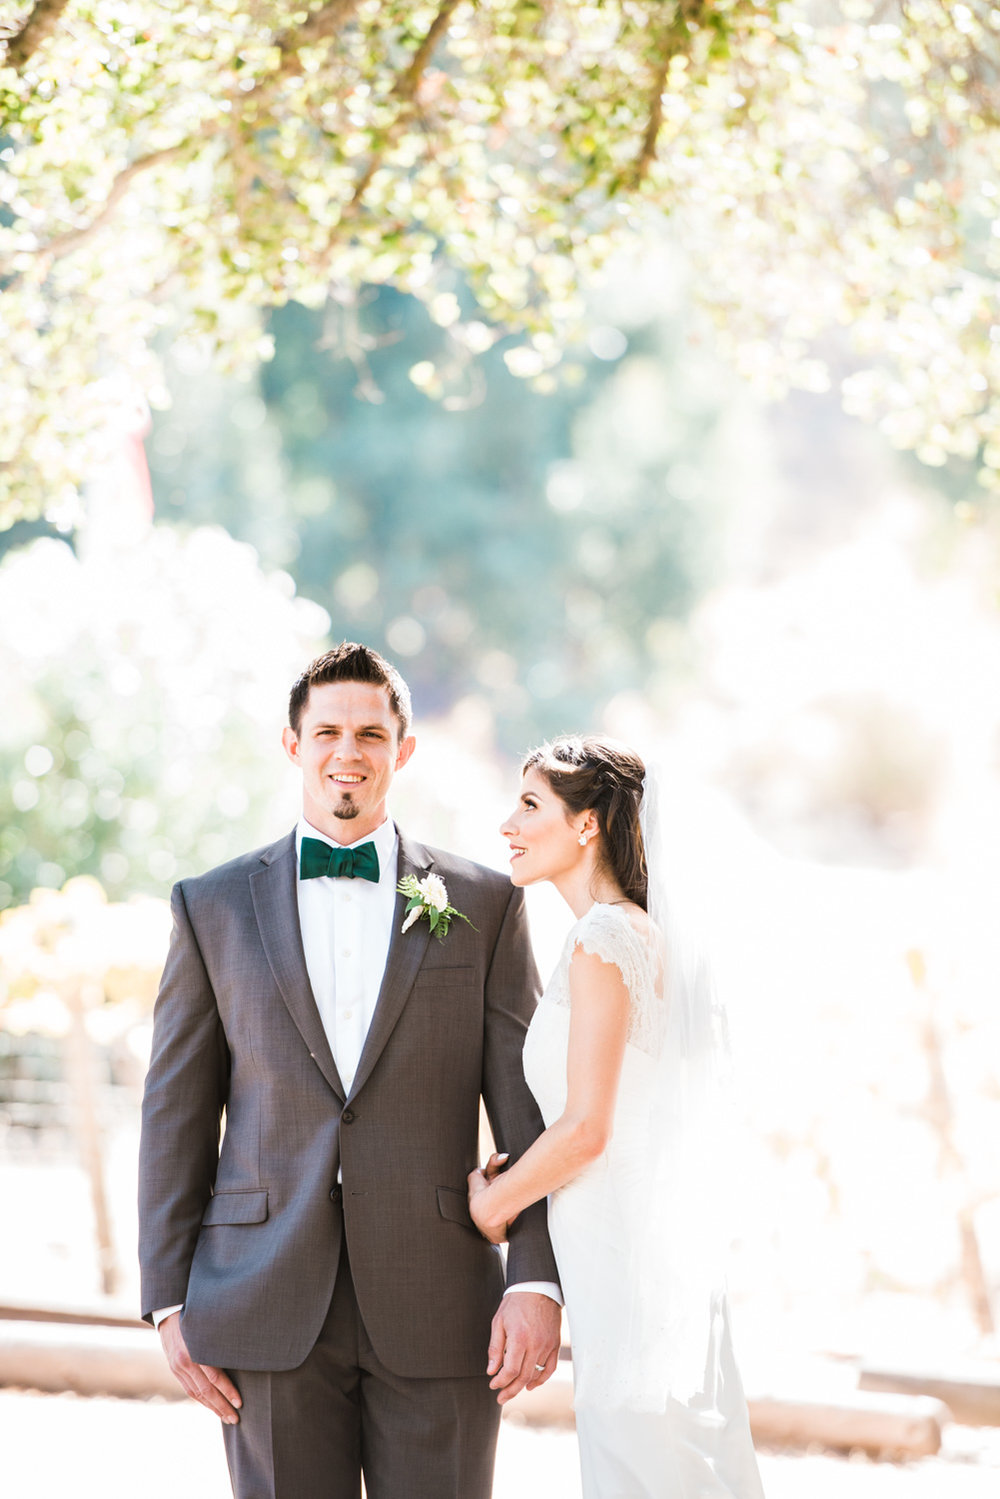 bride-groom-portraits-elliston-vineyard-wedding-photographer-afewgoodclicks.net